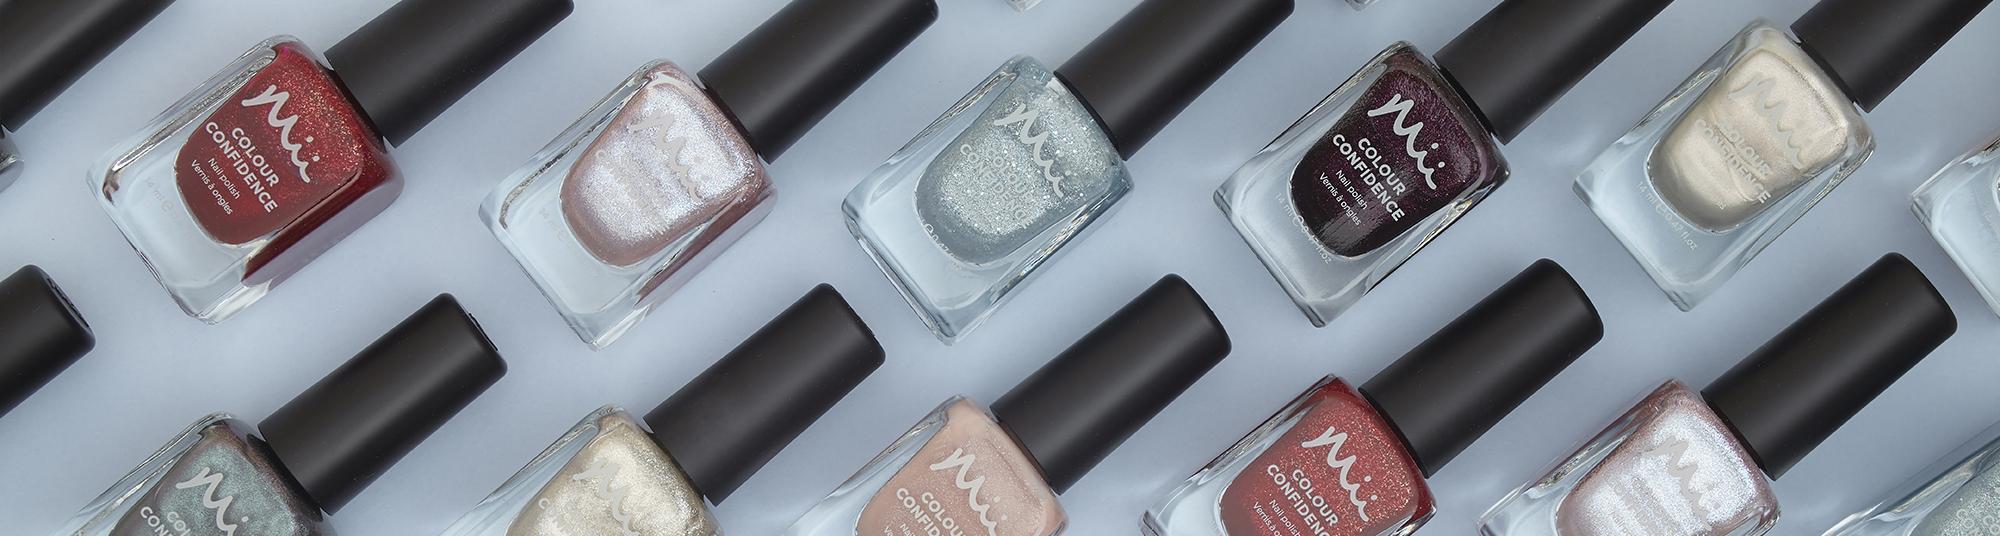 Mii Mii Colour Confidence Nail Polish Glitter & Metallic Category